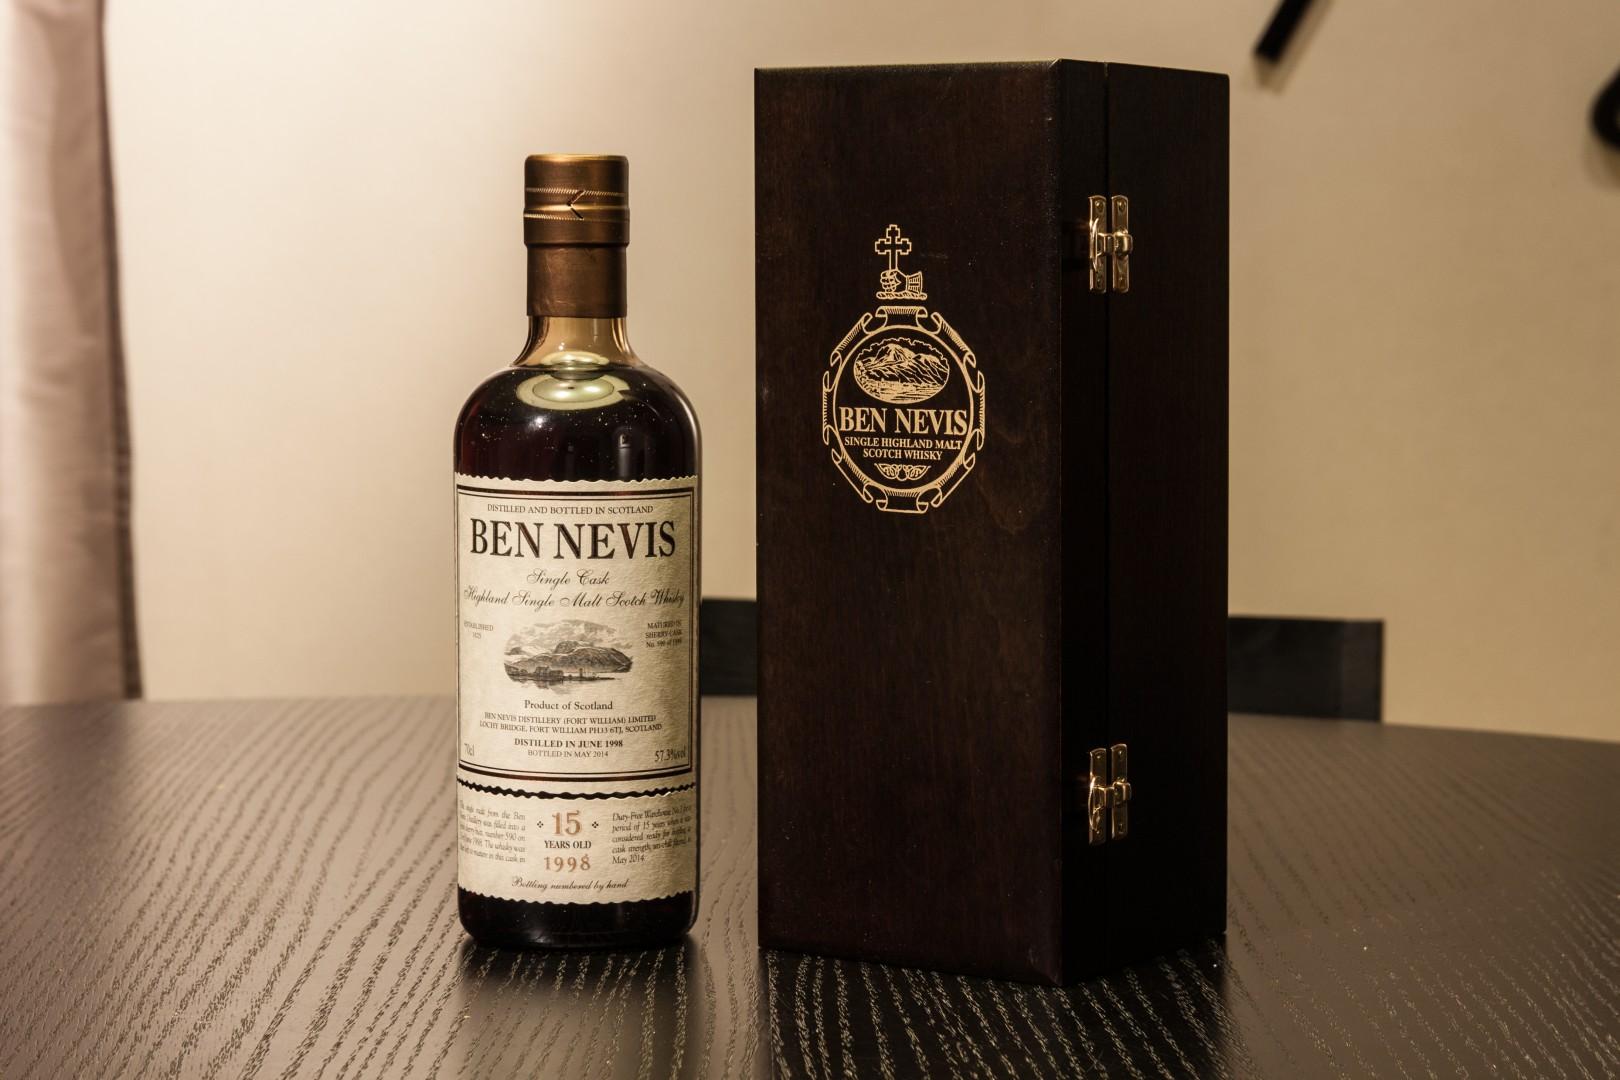 Ben Nevis 15